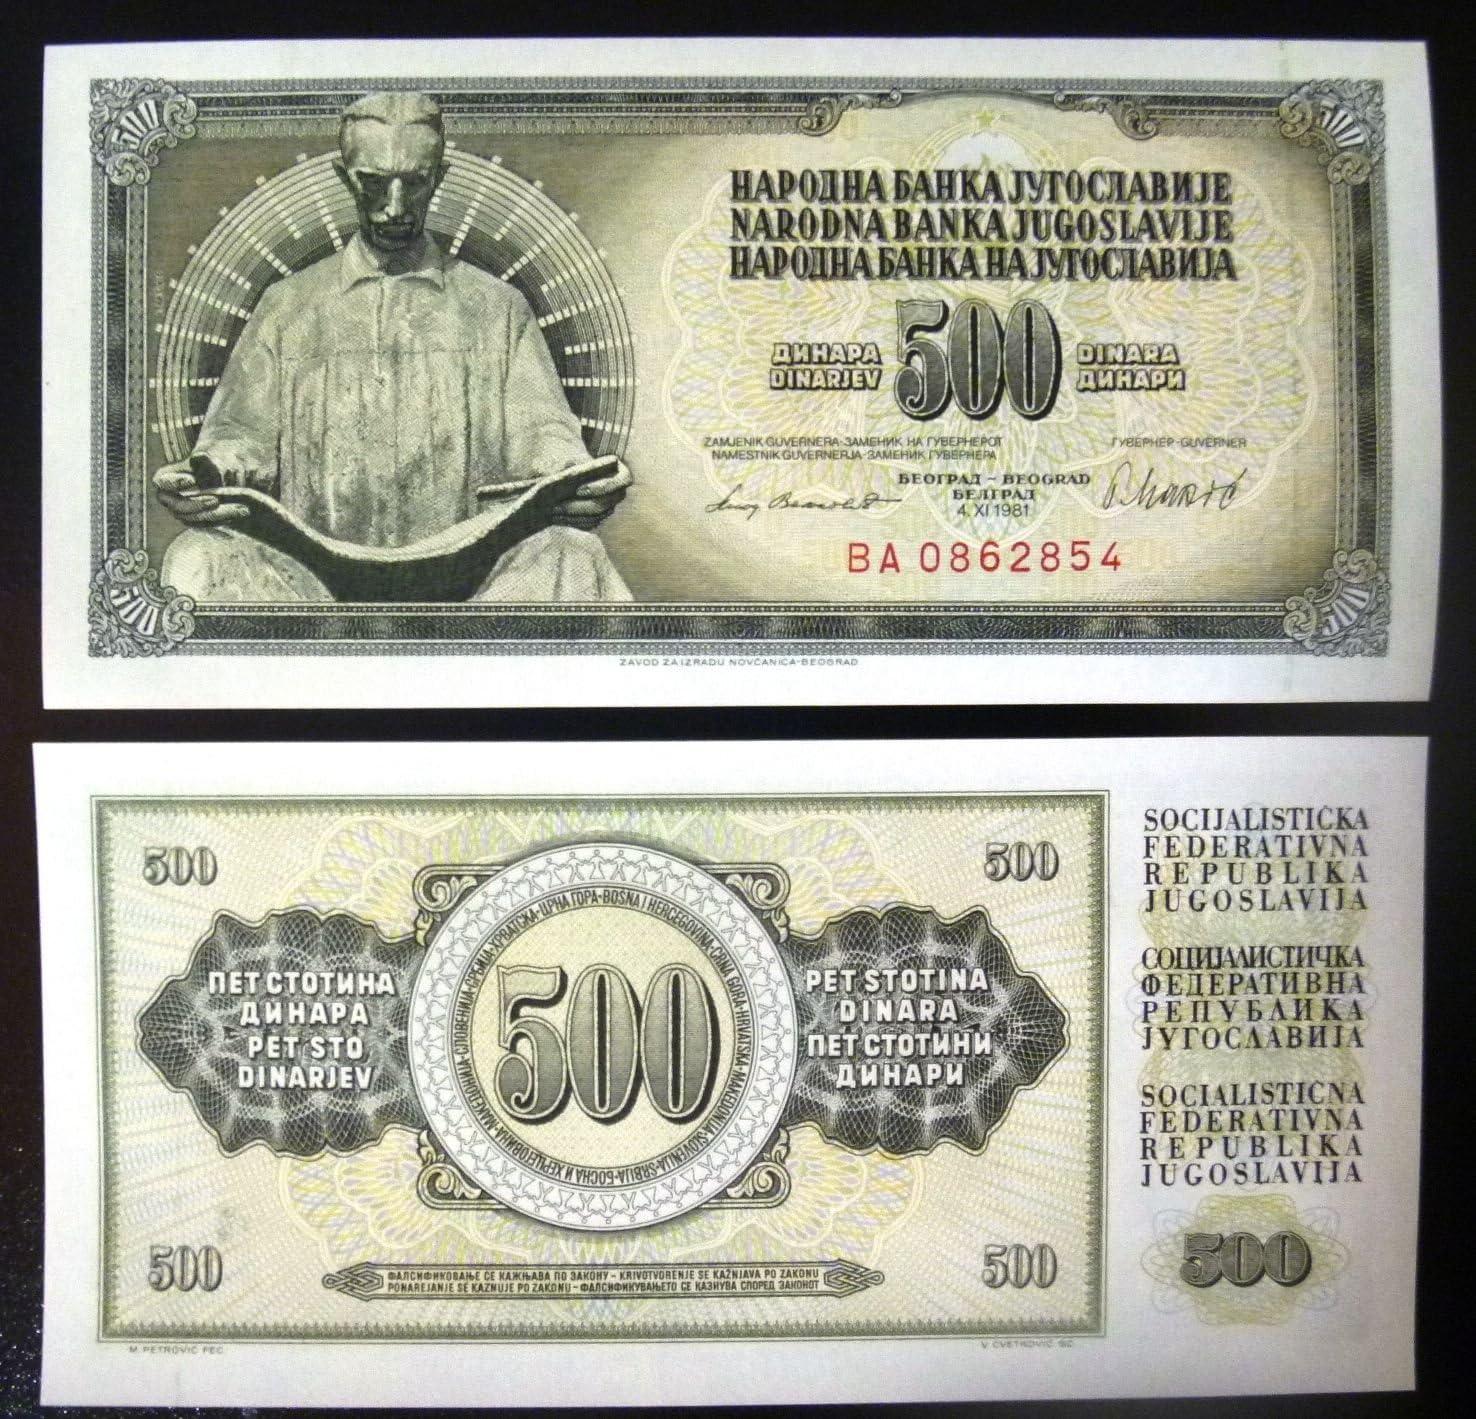 5 x 100 Dinara 1991 P-108 LOT Yugoslavia UNC /> Woman